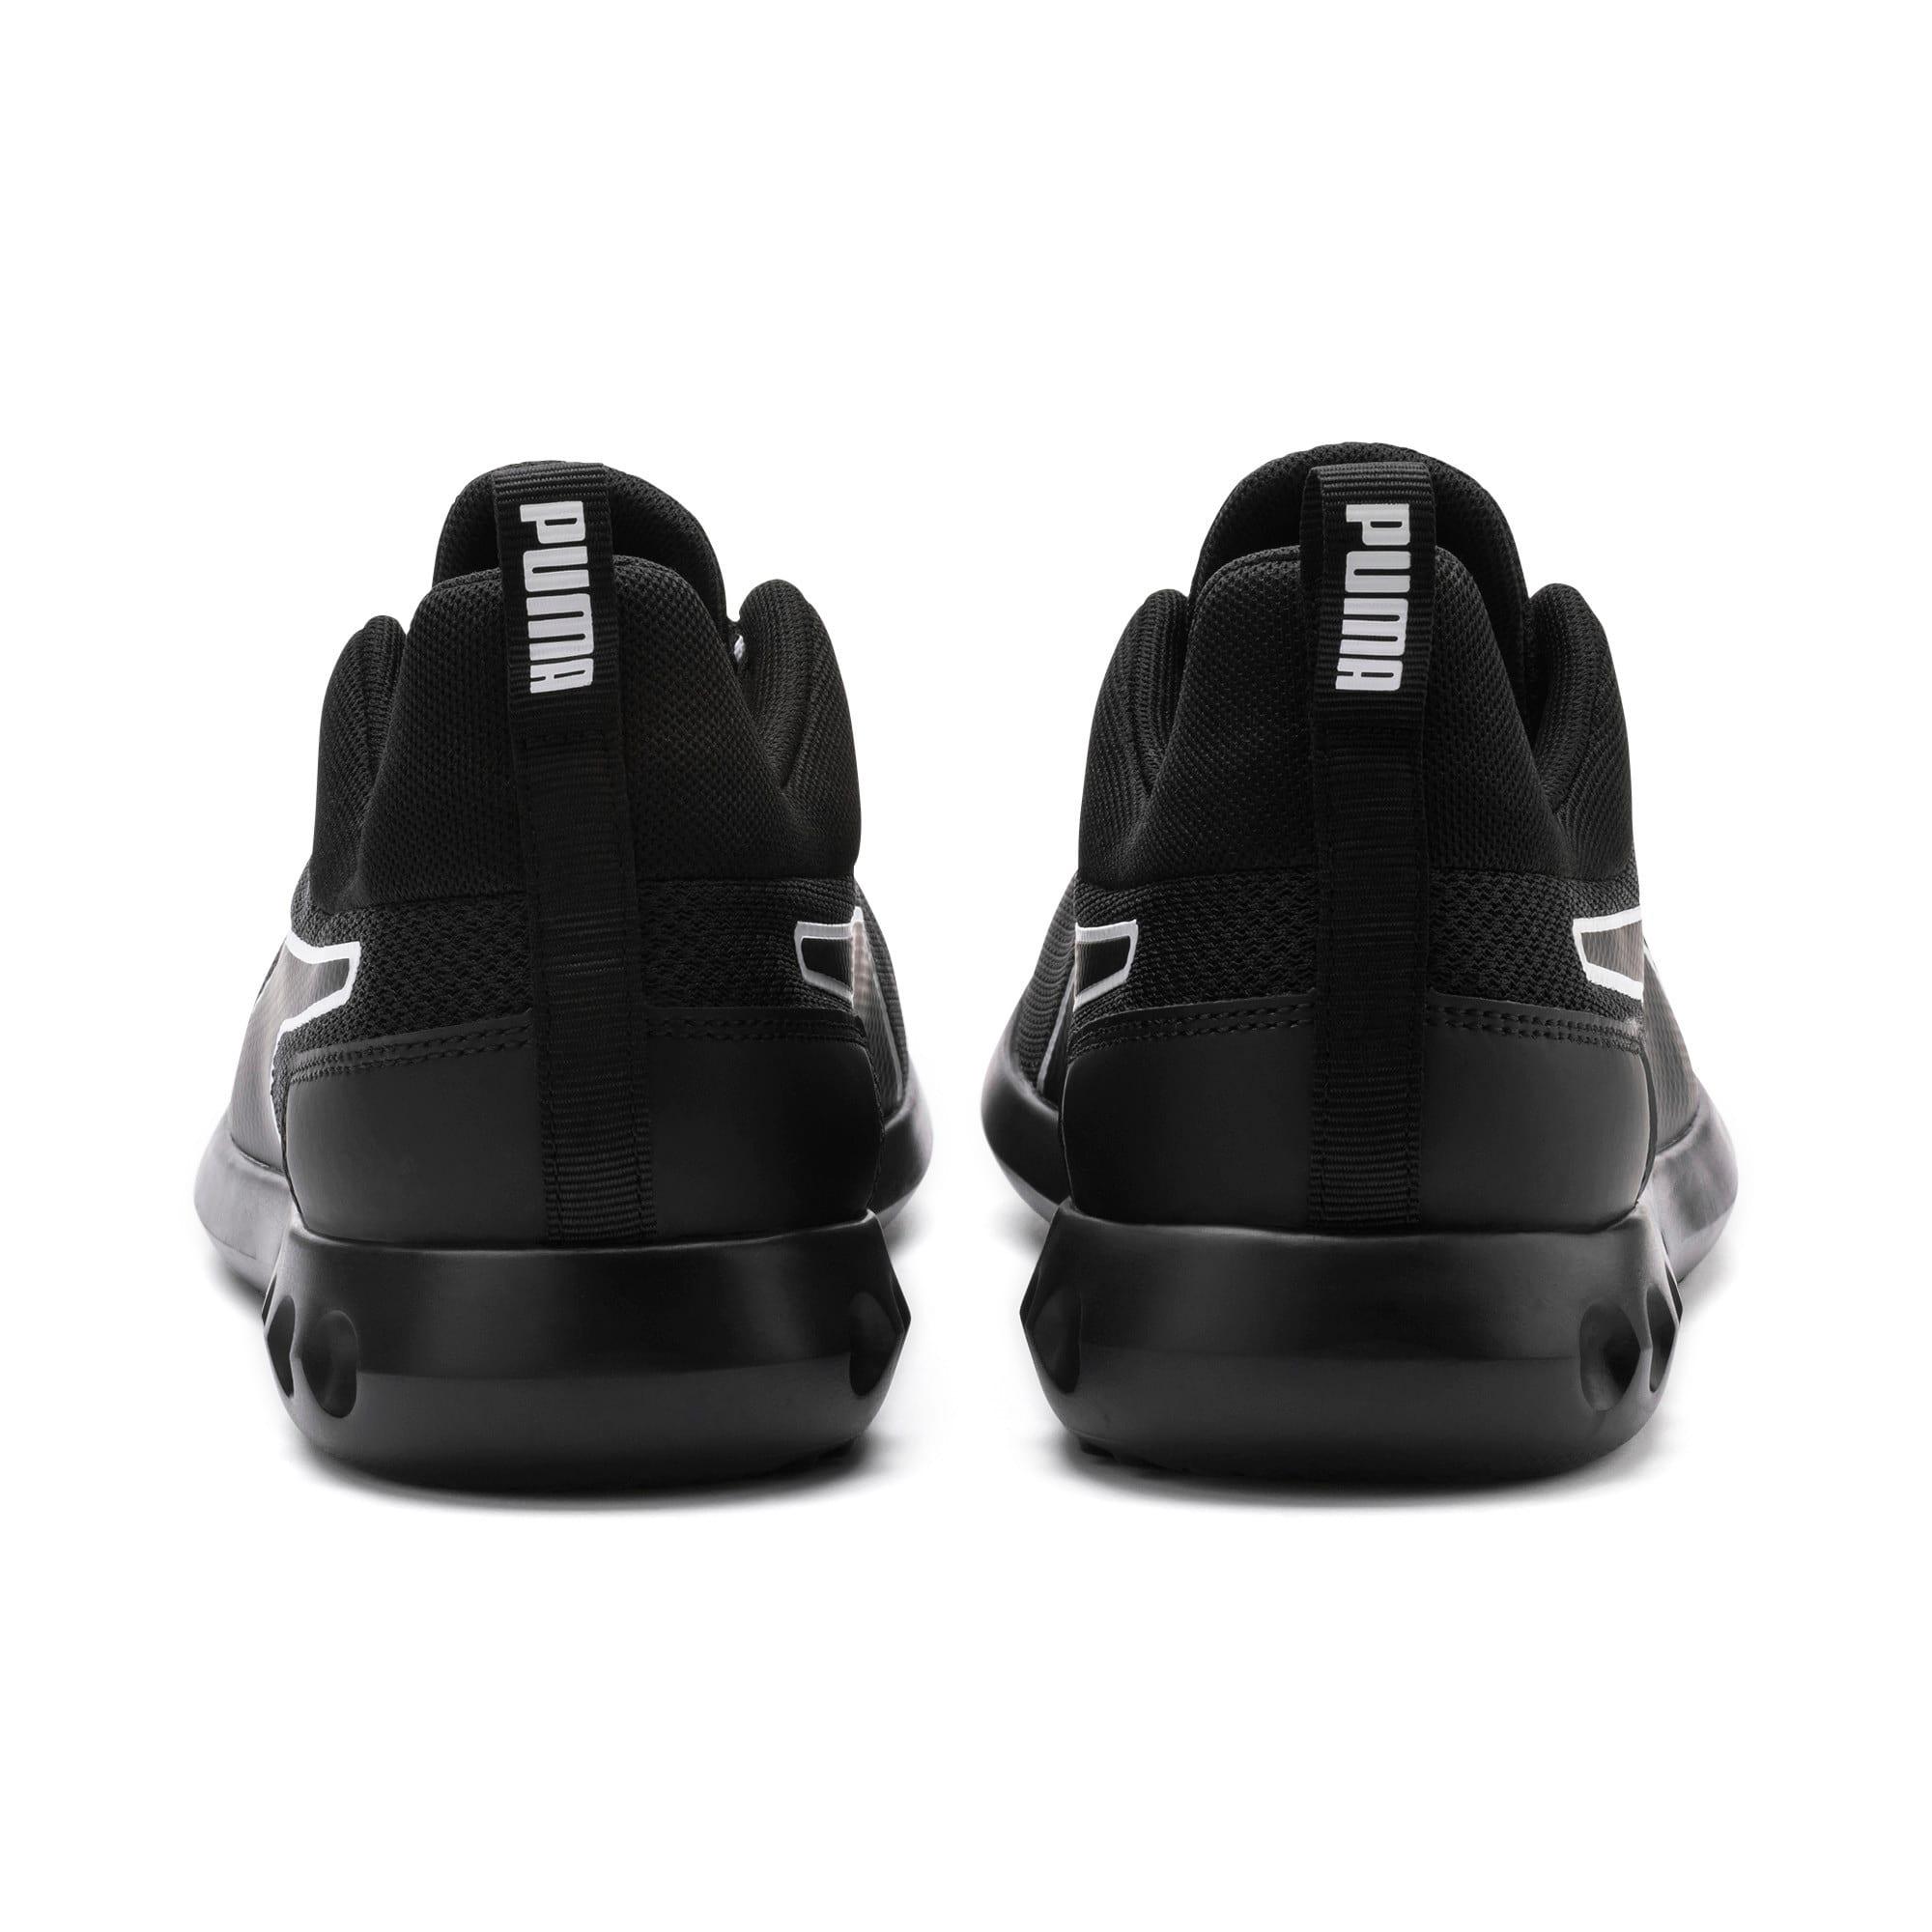 Thumbnail 3 of Carson 2 Concave Herren Sneaker, Puma Black-Puma White, medium